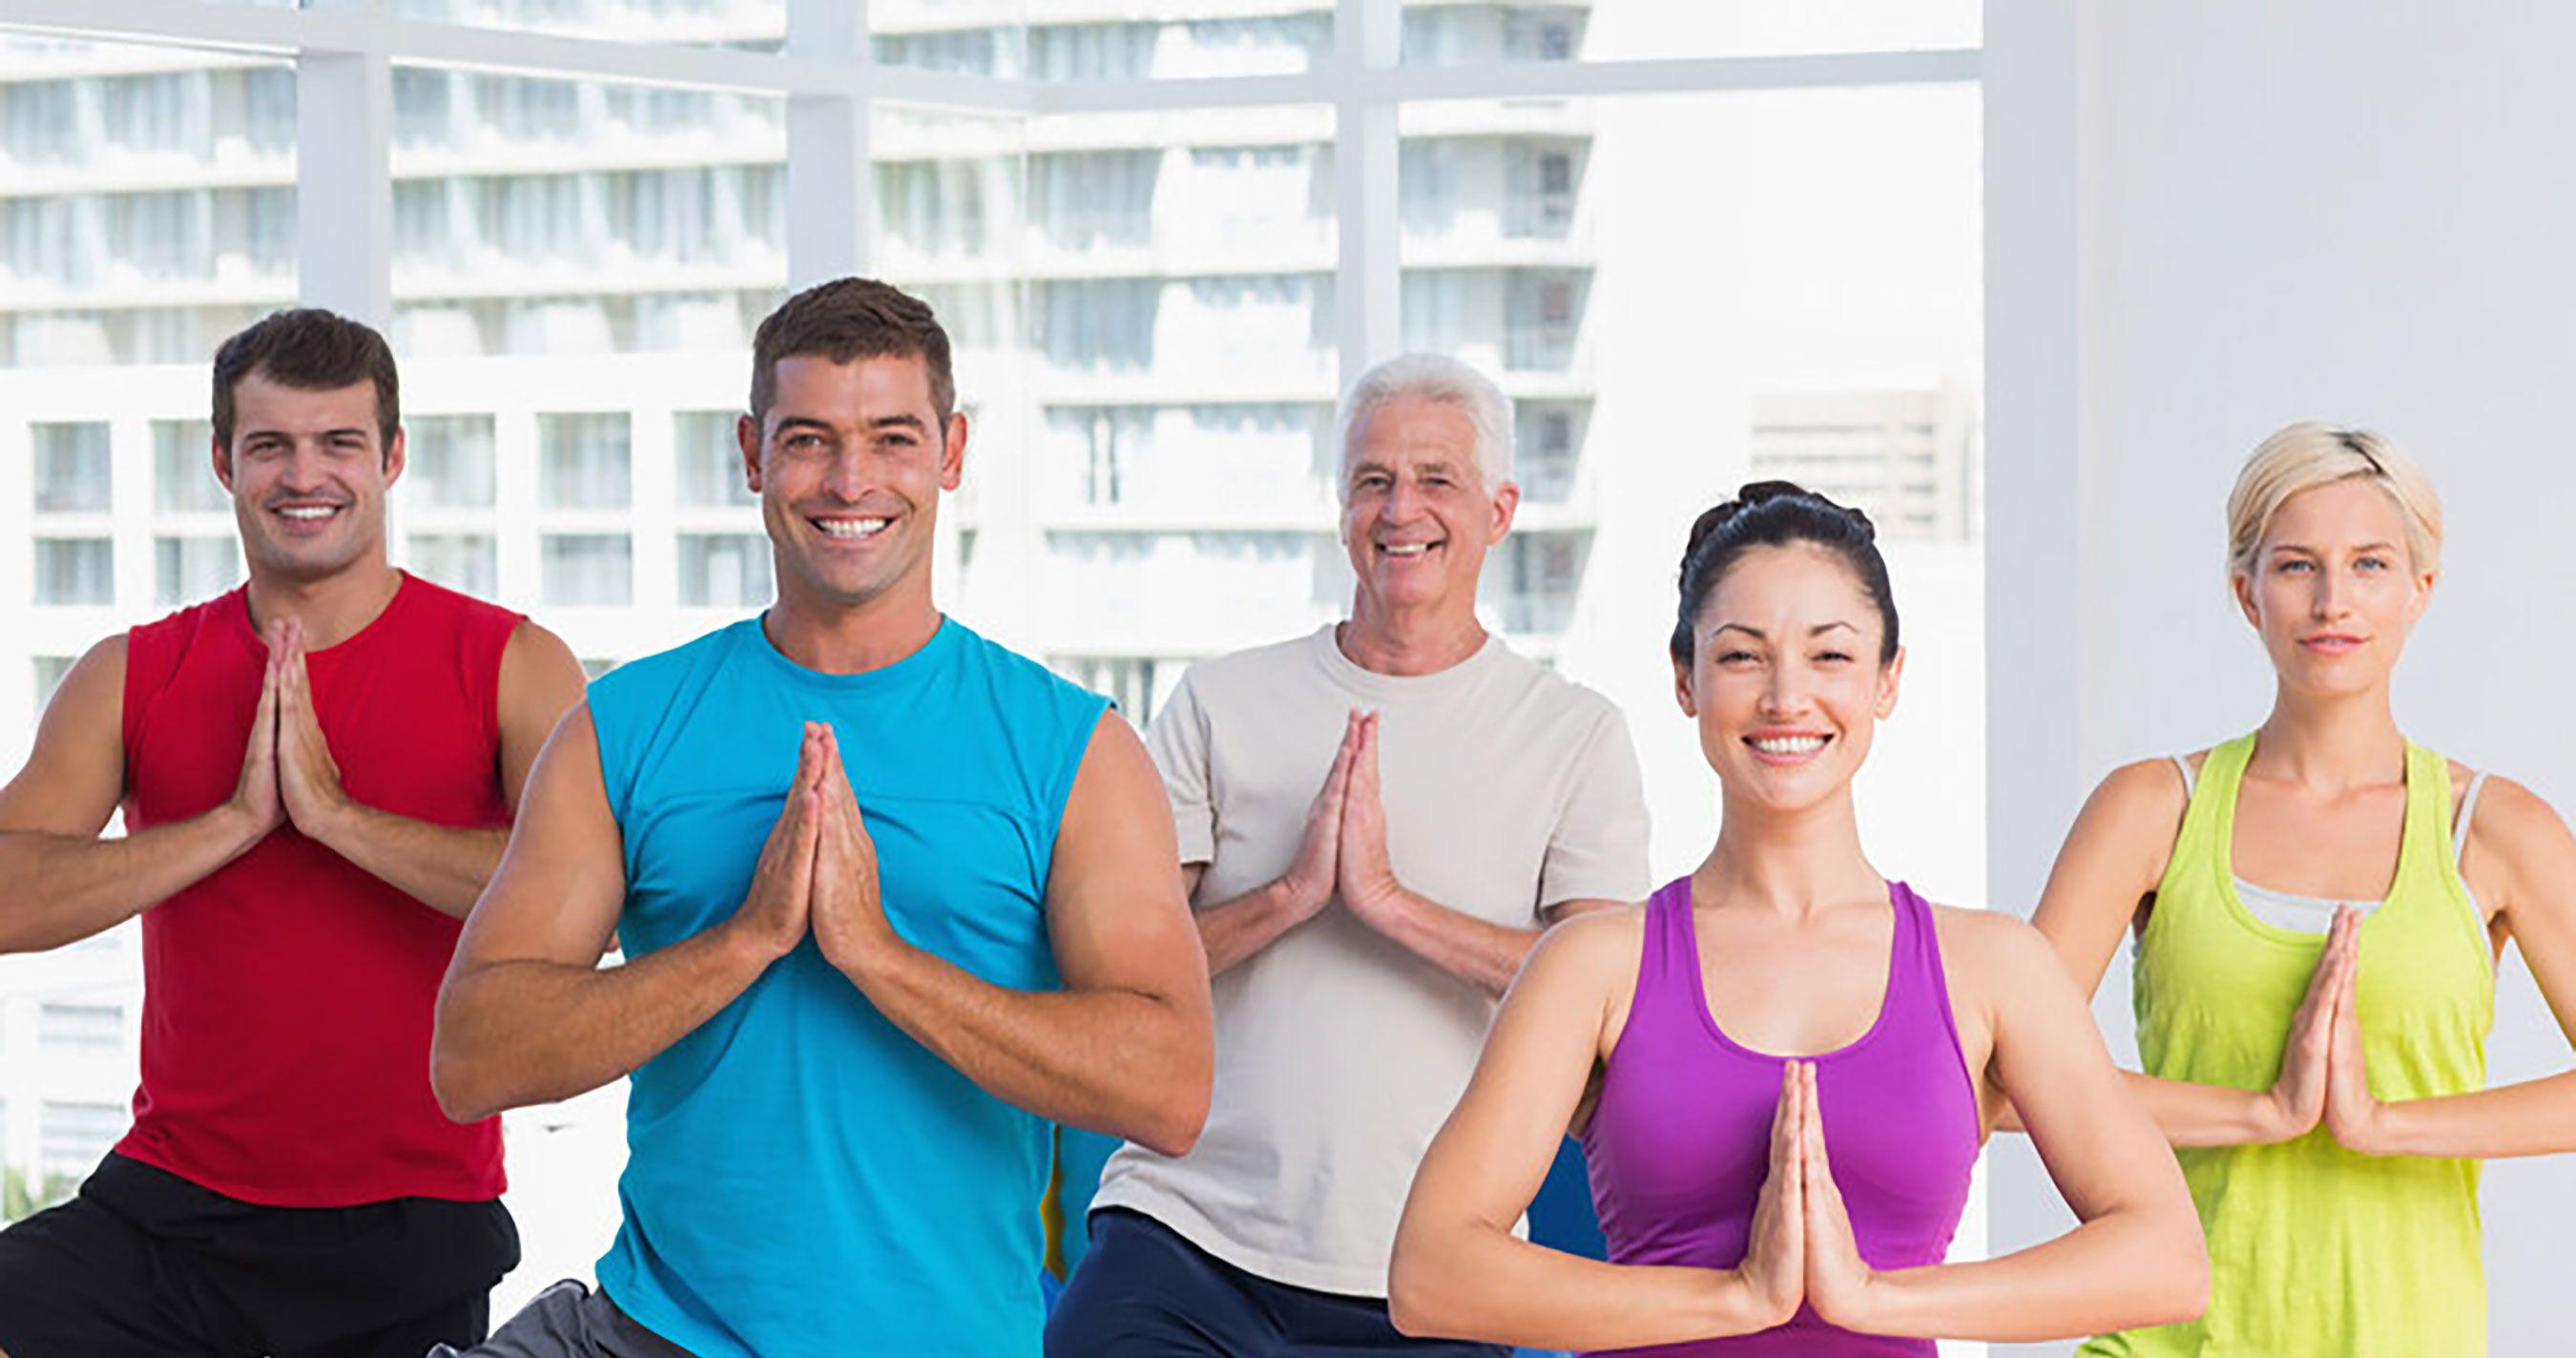 Beginner Yoga Classes in Orlando, FL